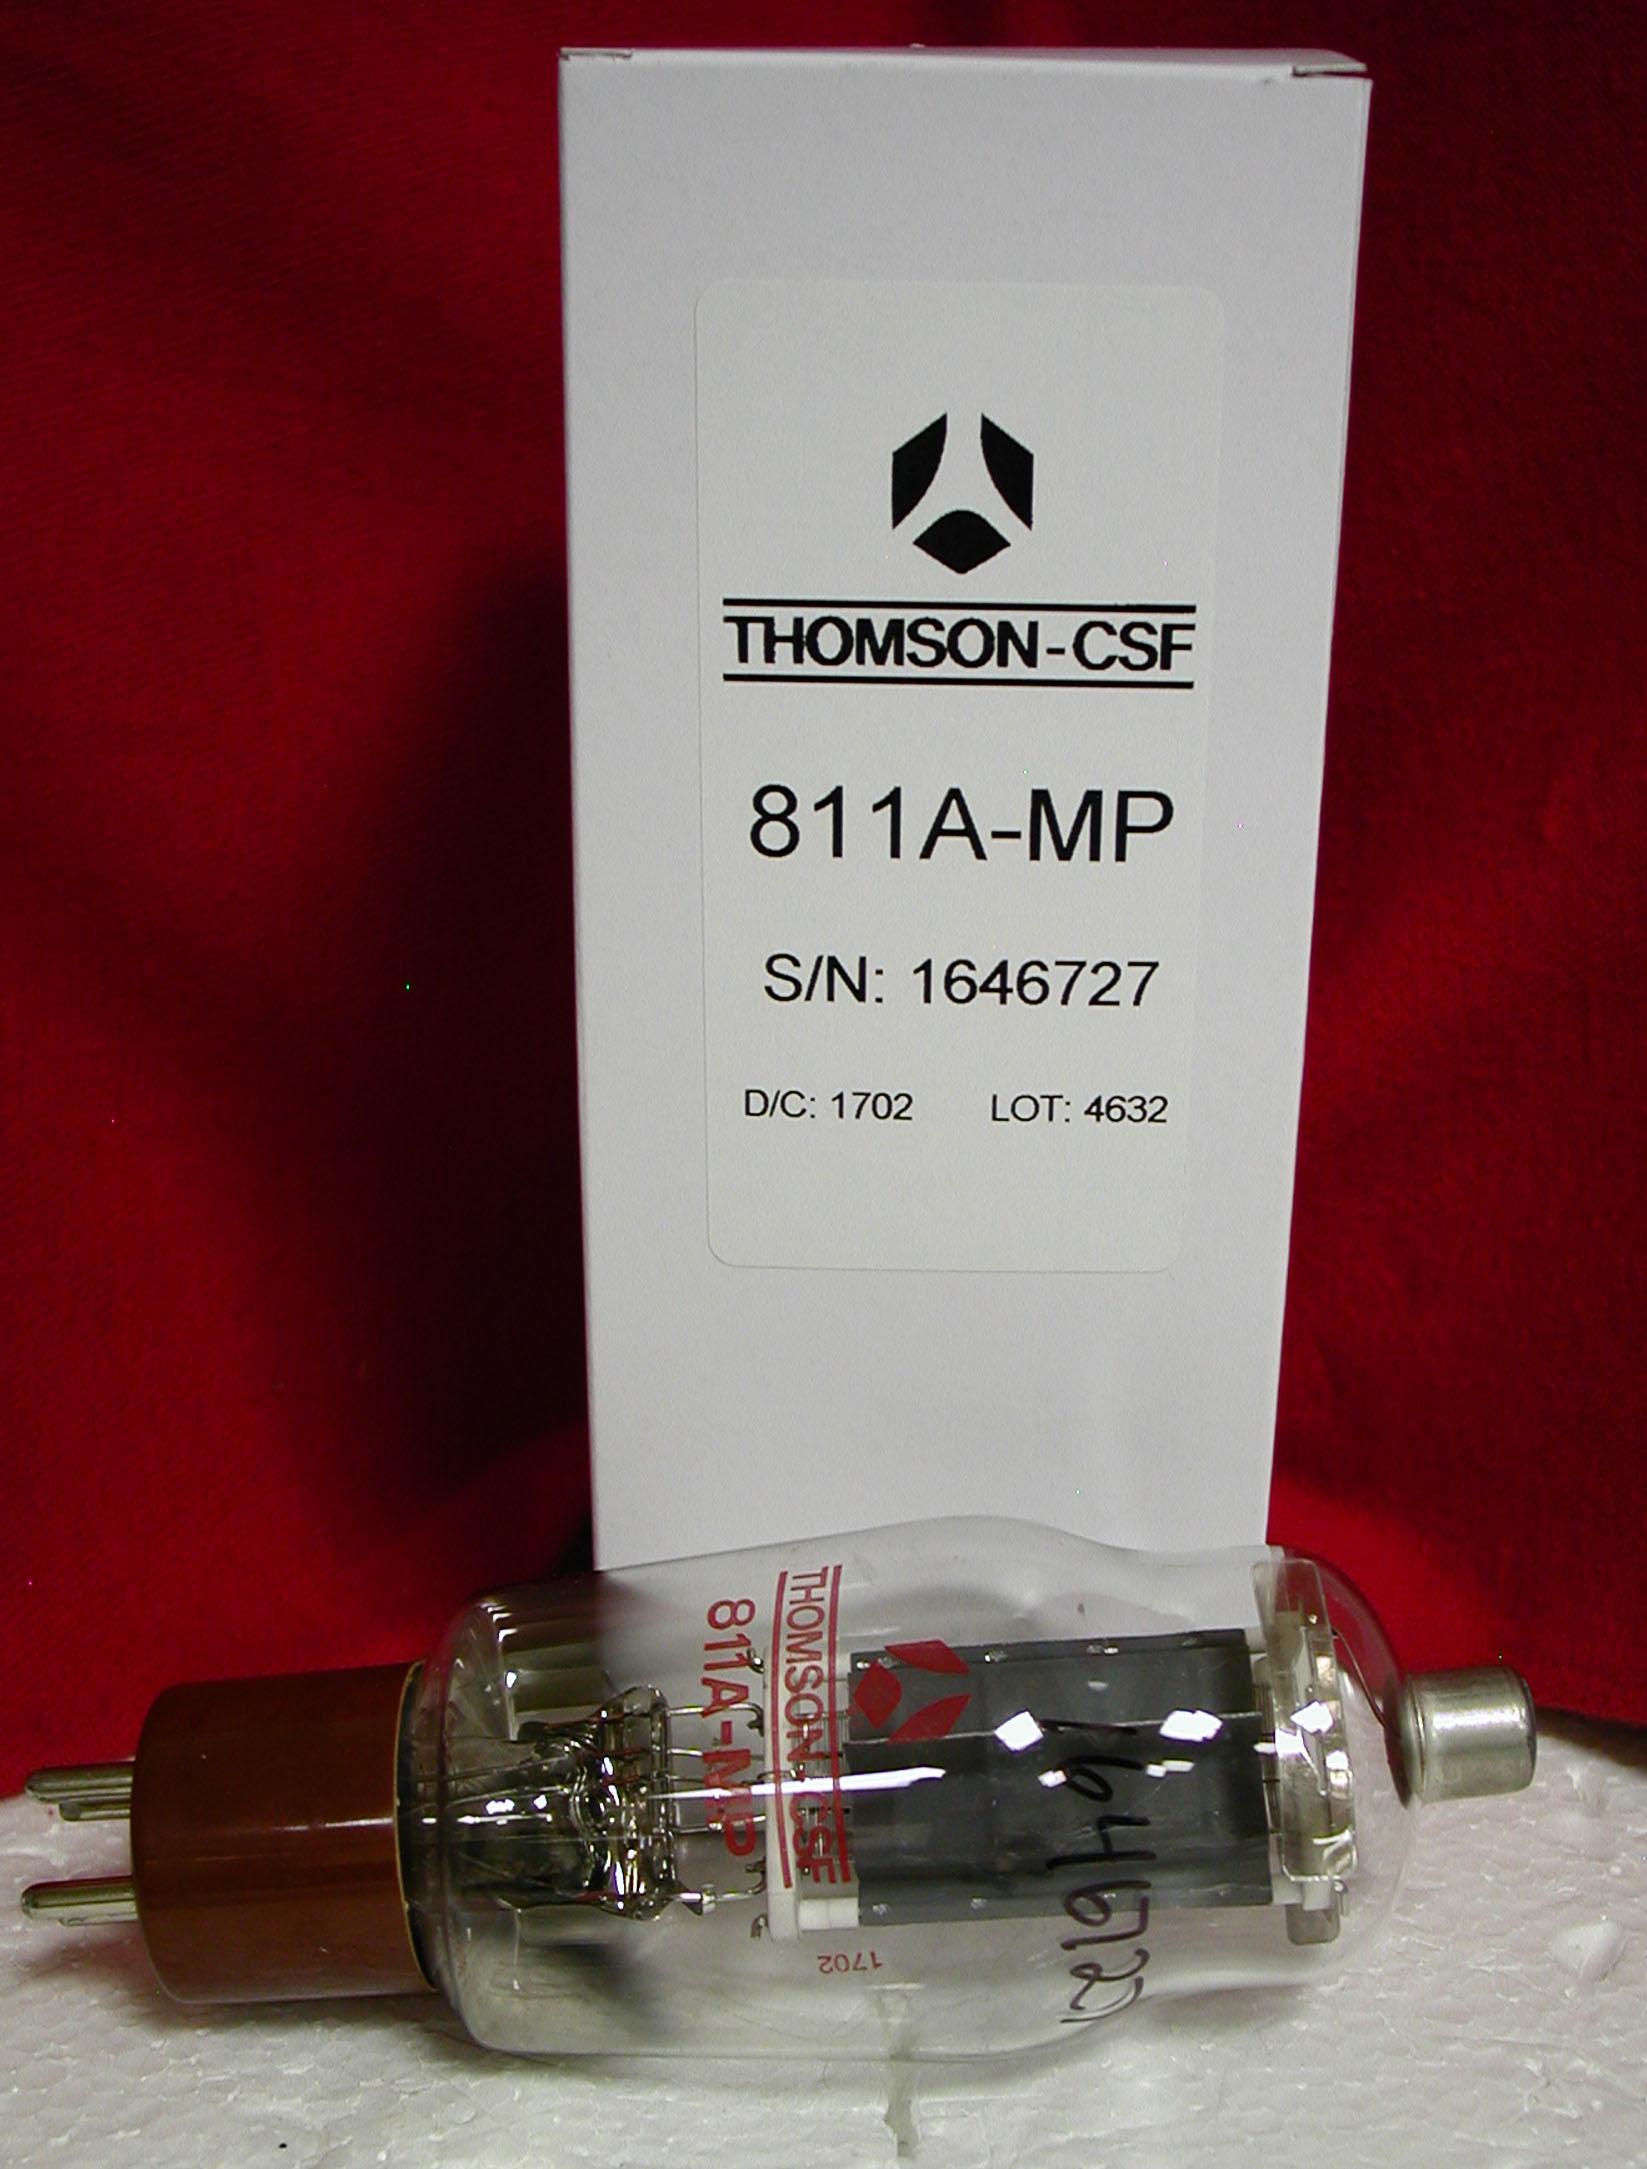 Thomson-CSF 811A transmitting tube